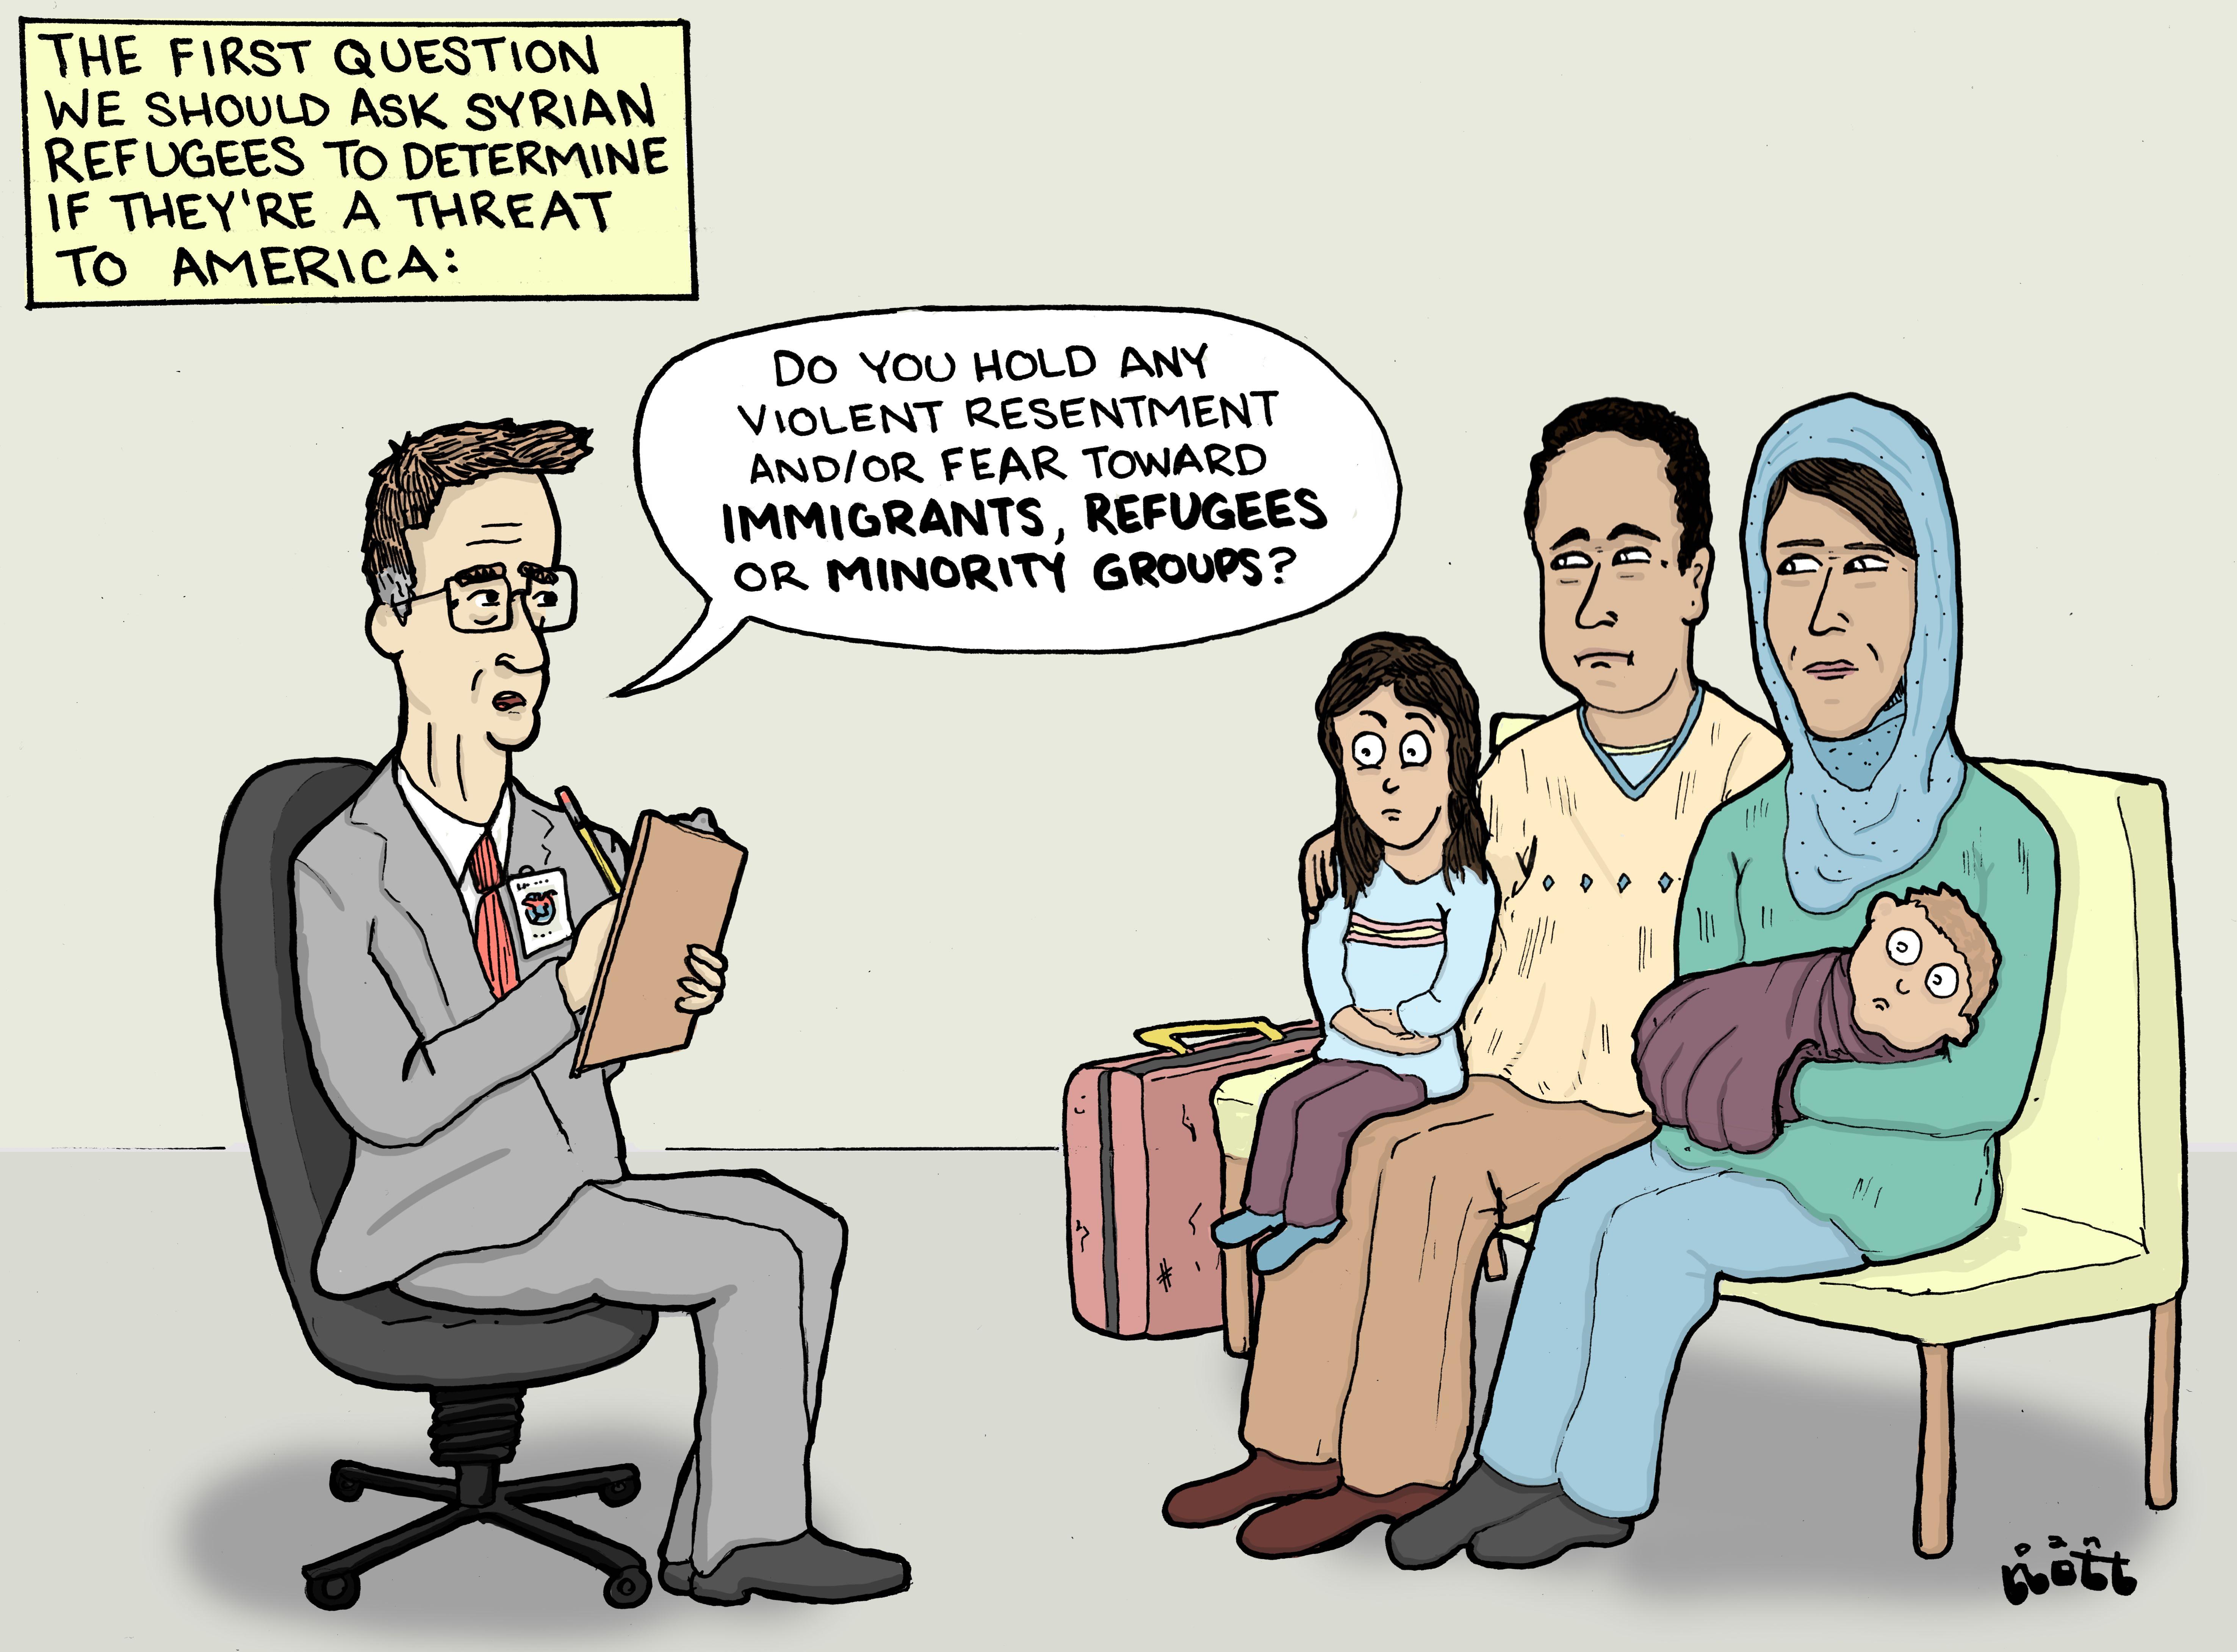 Vetting Syrian Refugees